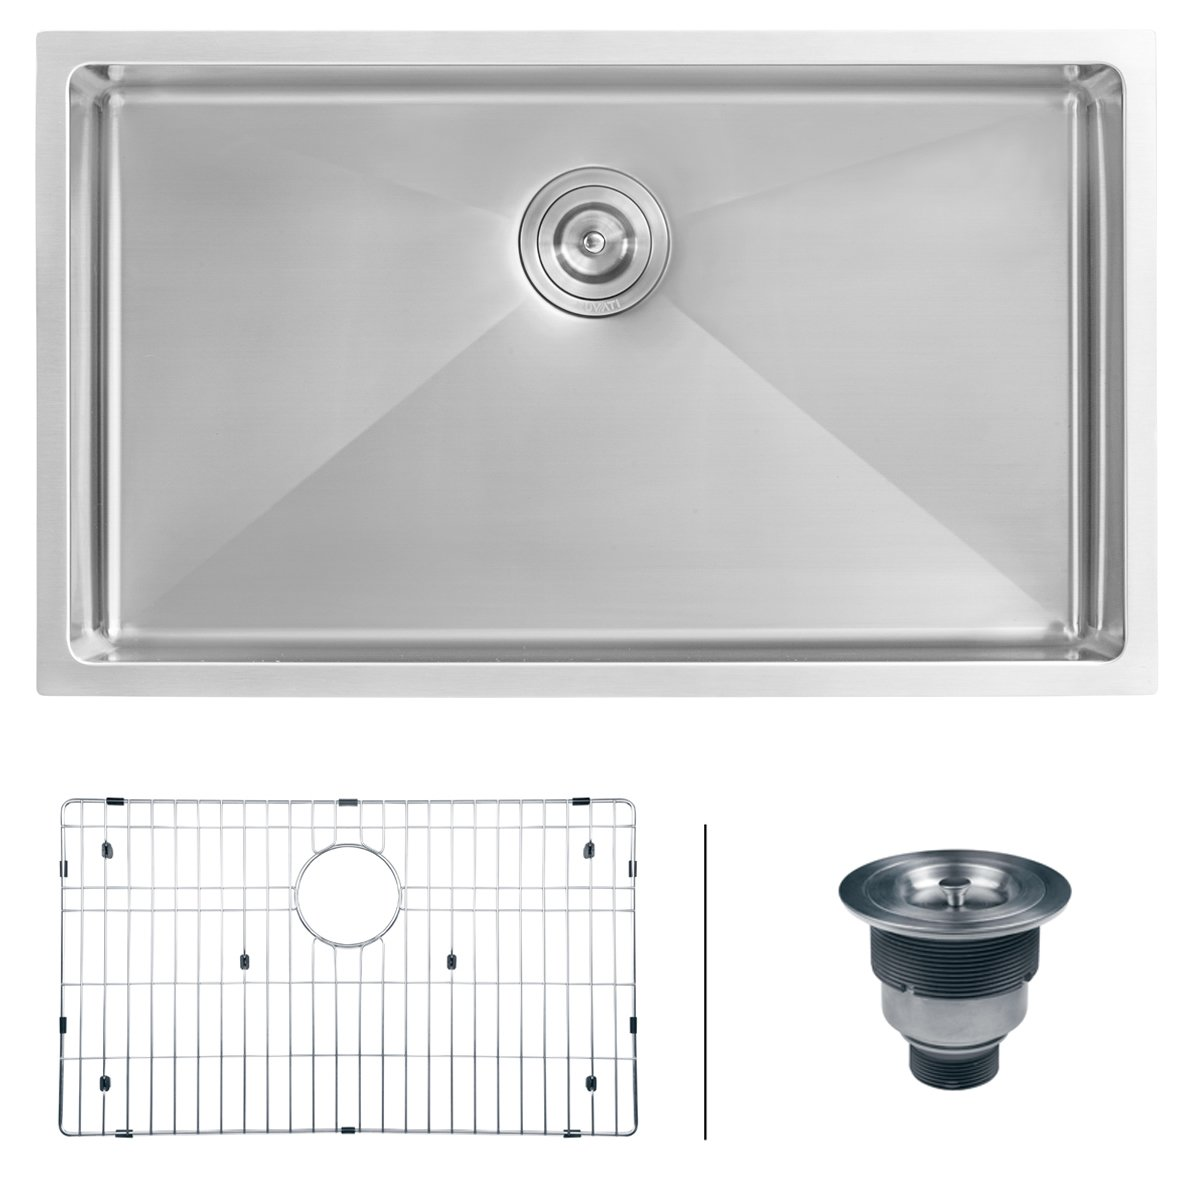 Ruvati RVH7400 Undermount 16 Gauge 32'' Kitchen Sink Single Bowl, Stainless Steel by Ruvati